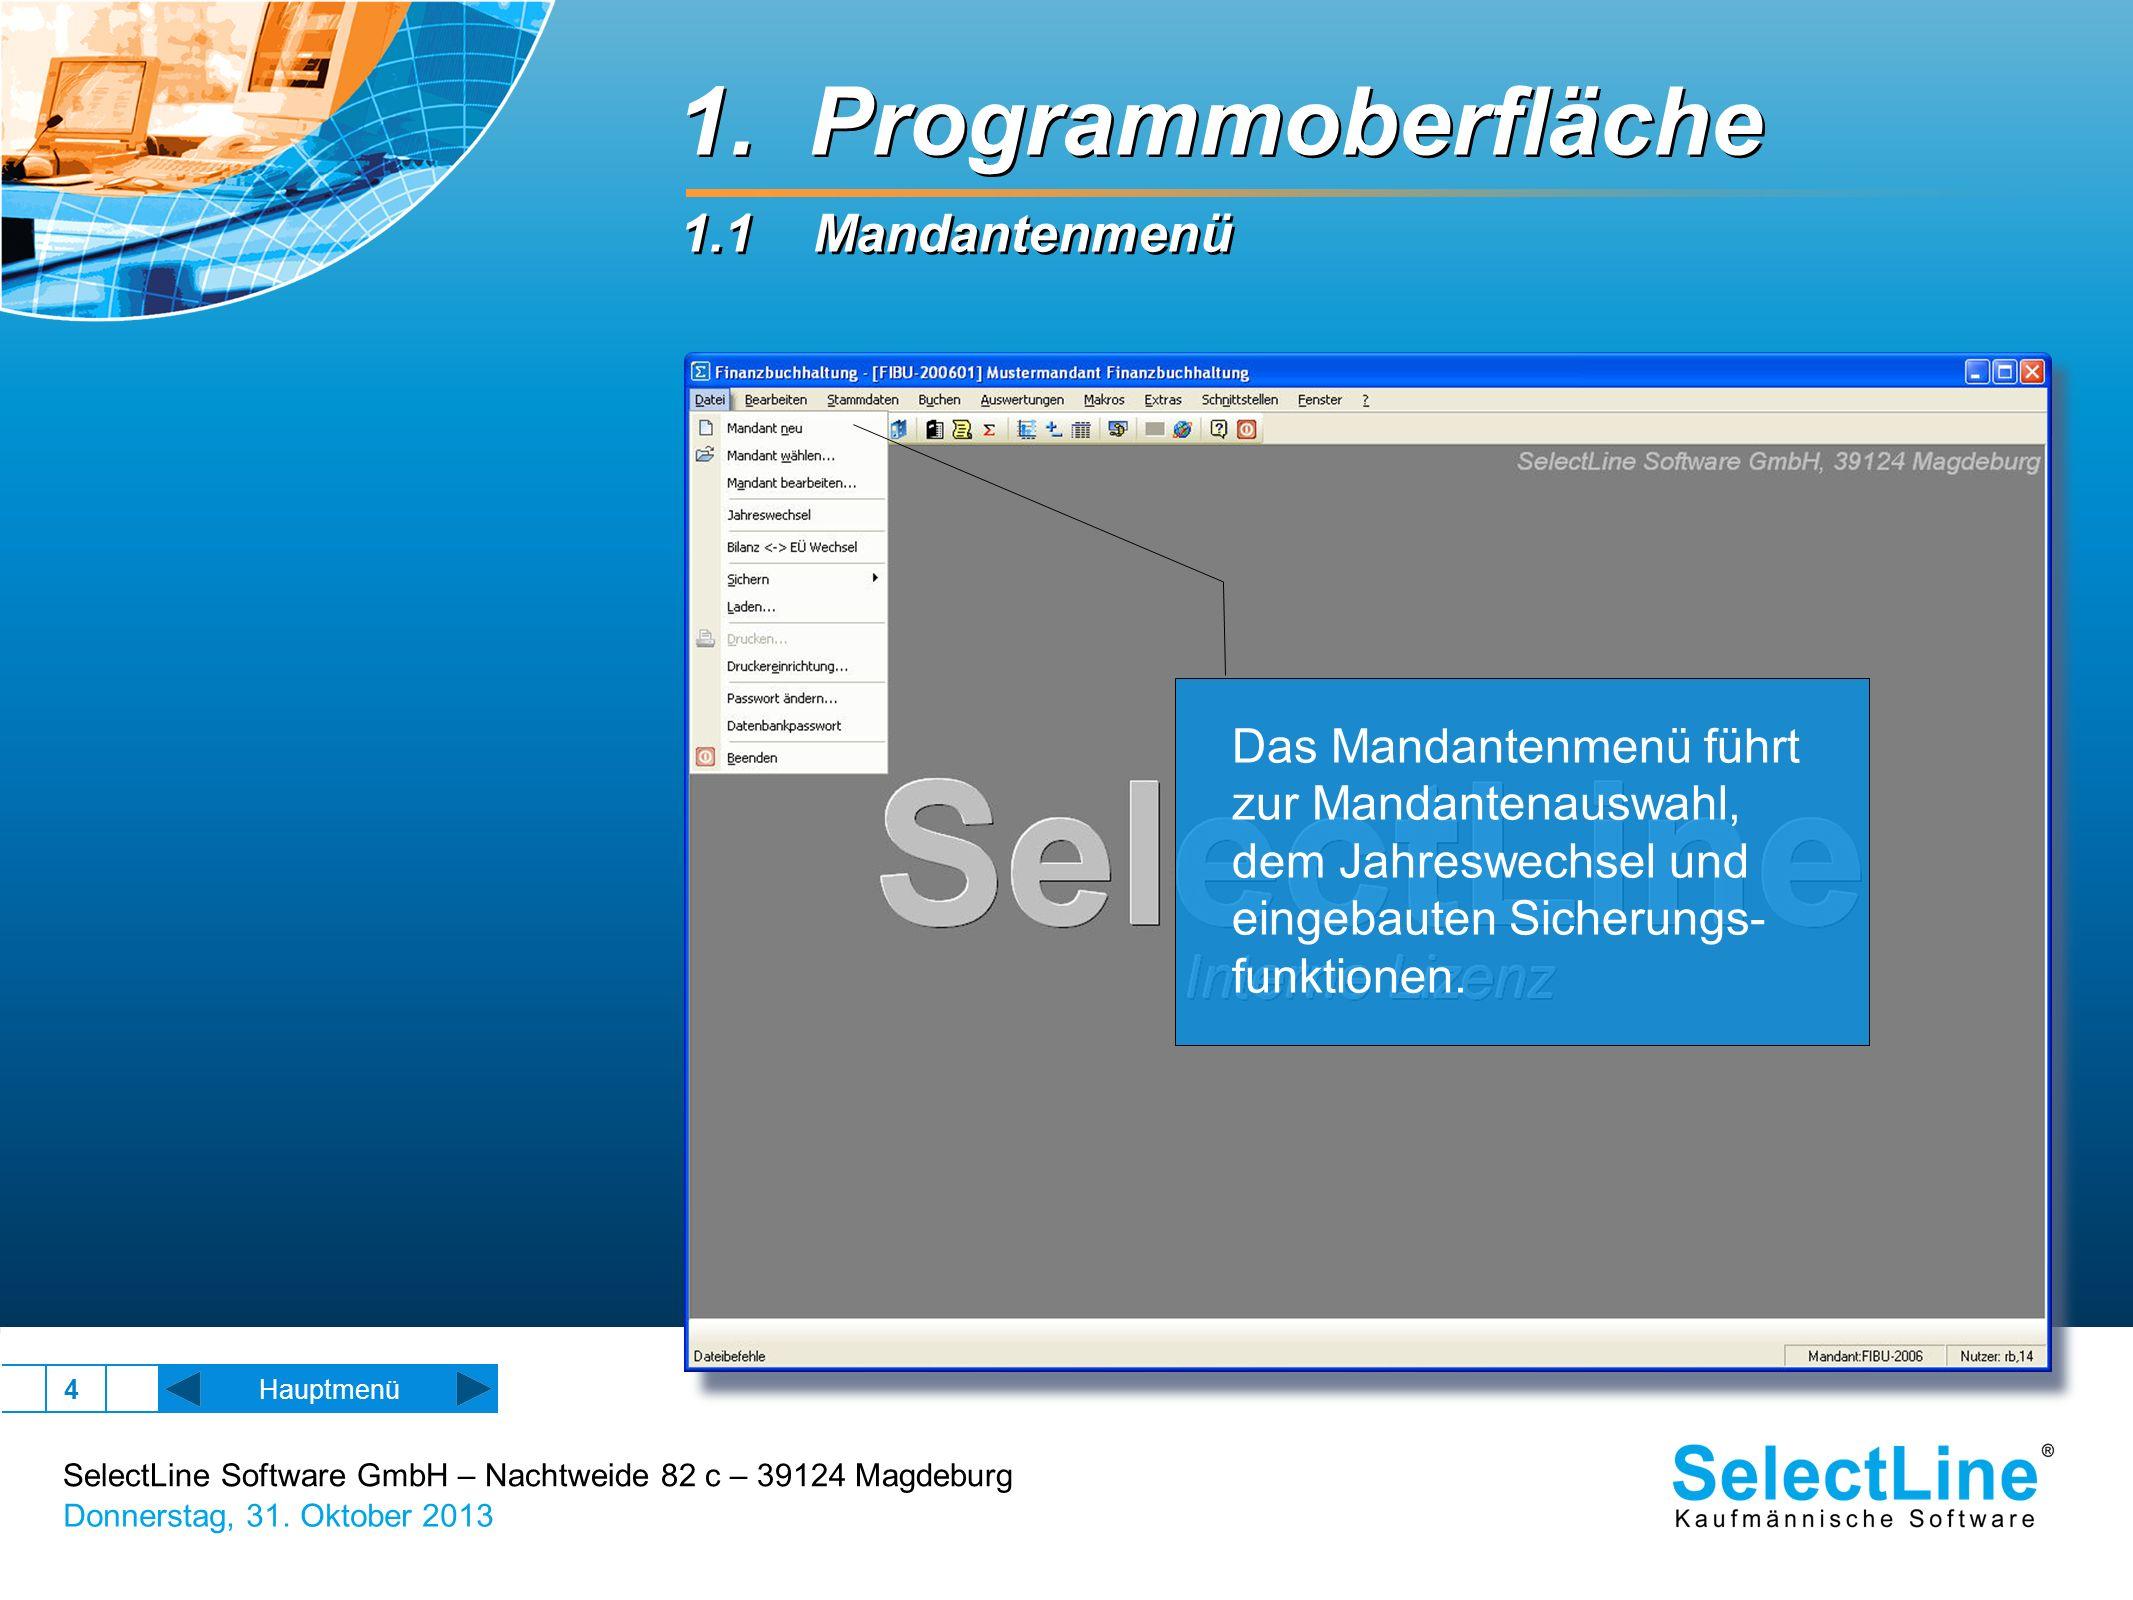 SelectLine Software GmbH – Nachtweide 82 c – 39124 Magdeburg Donnerstag, 31. Oktober 2013 4 Hauptmenü Das Mandantenmenü führt zur Mandantenauswahl, de